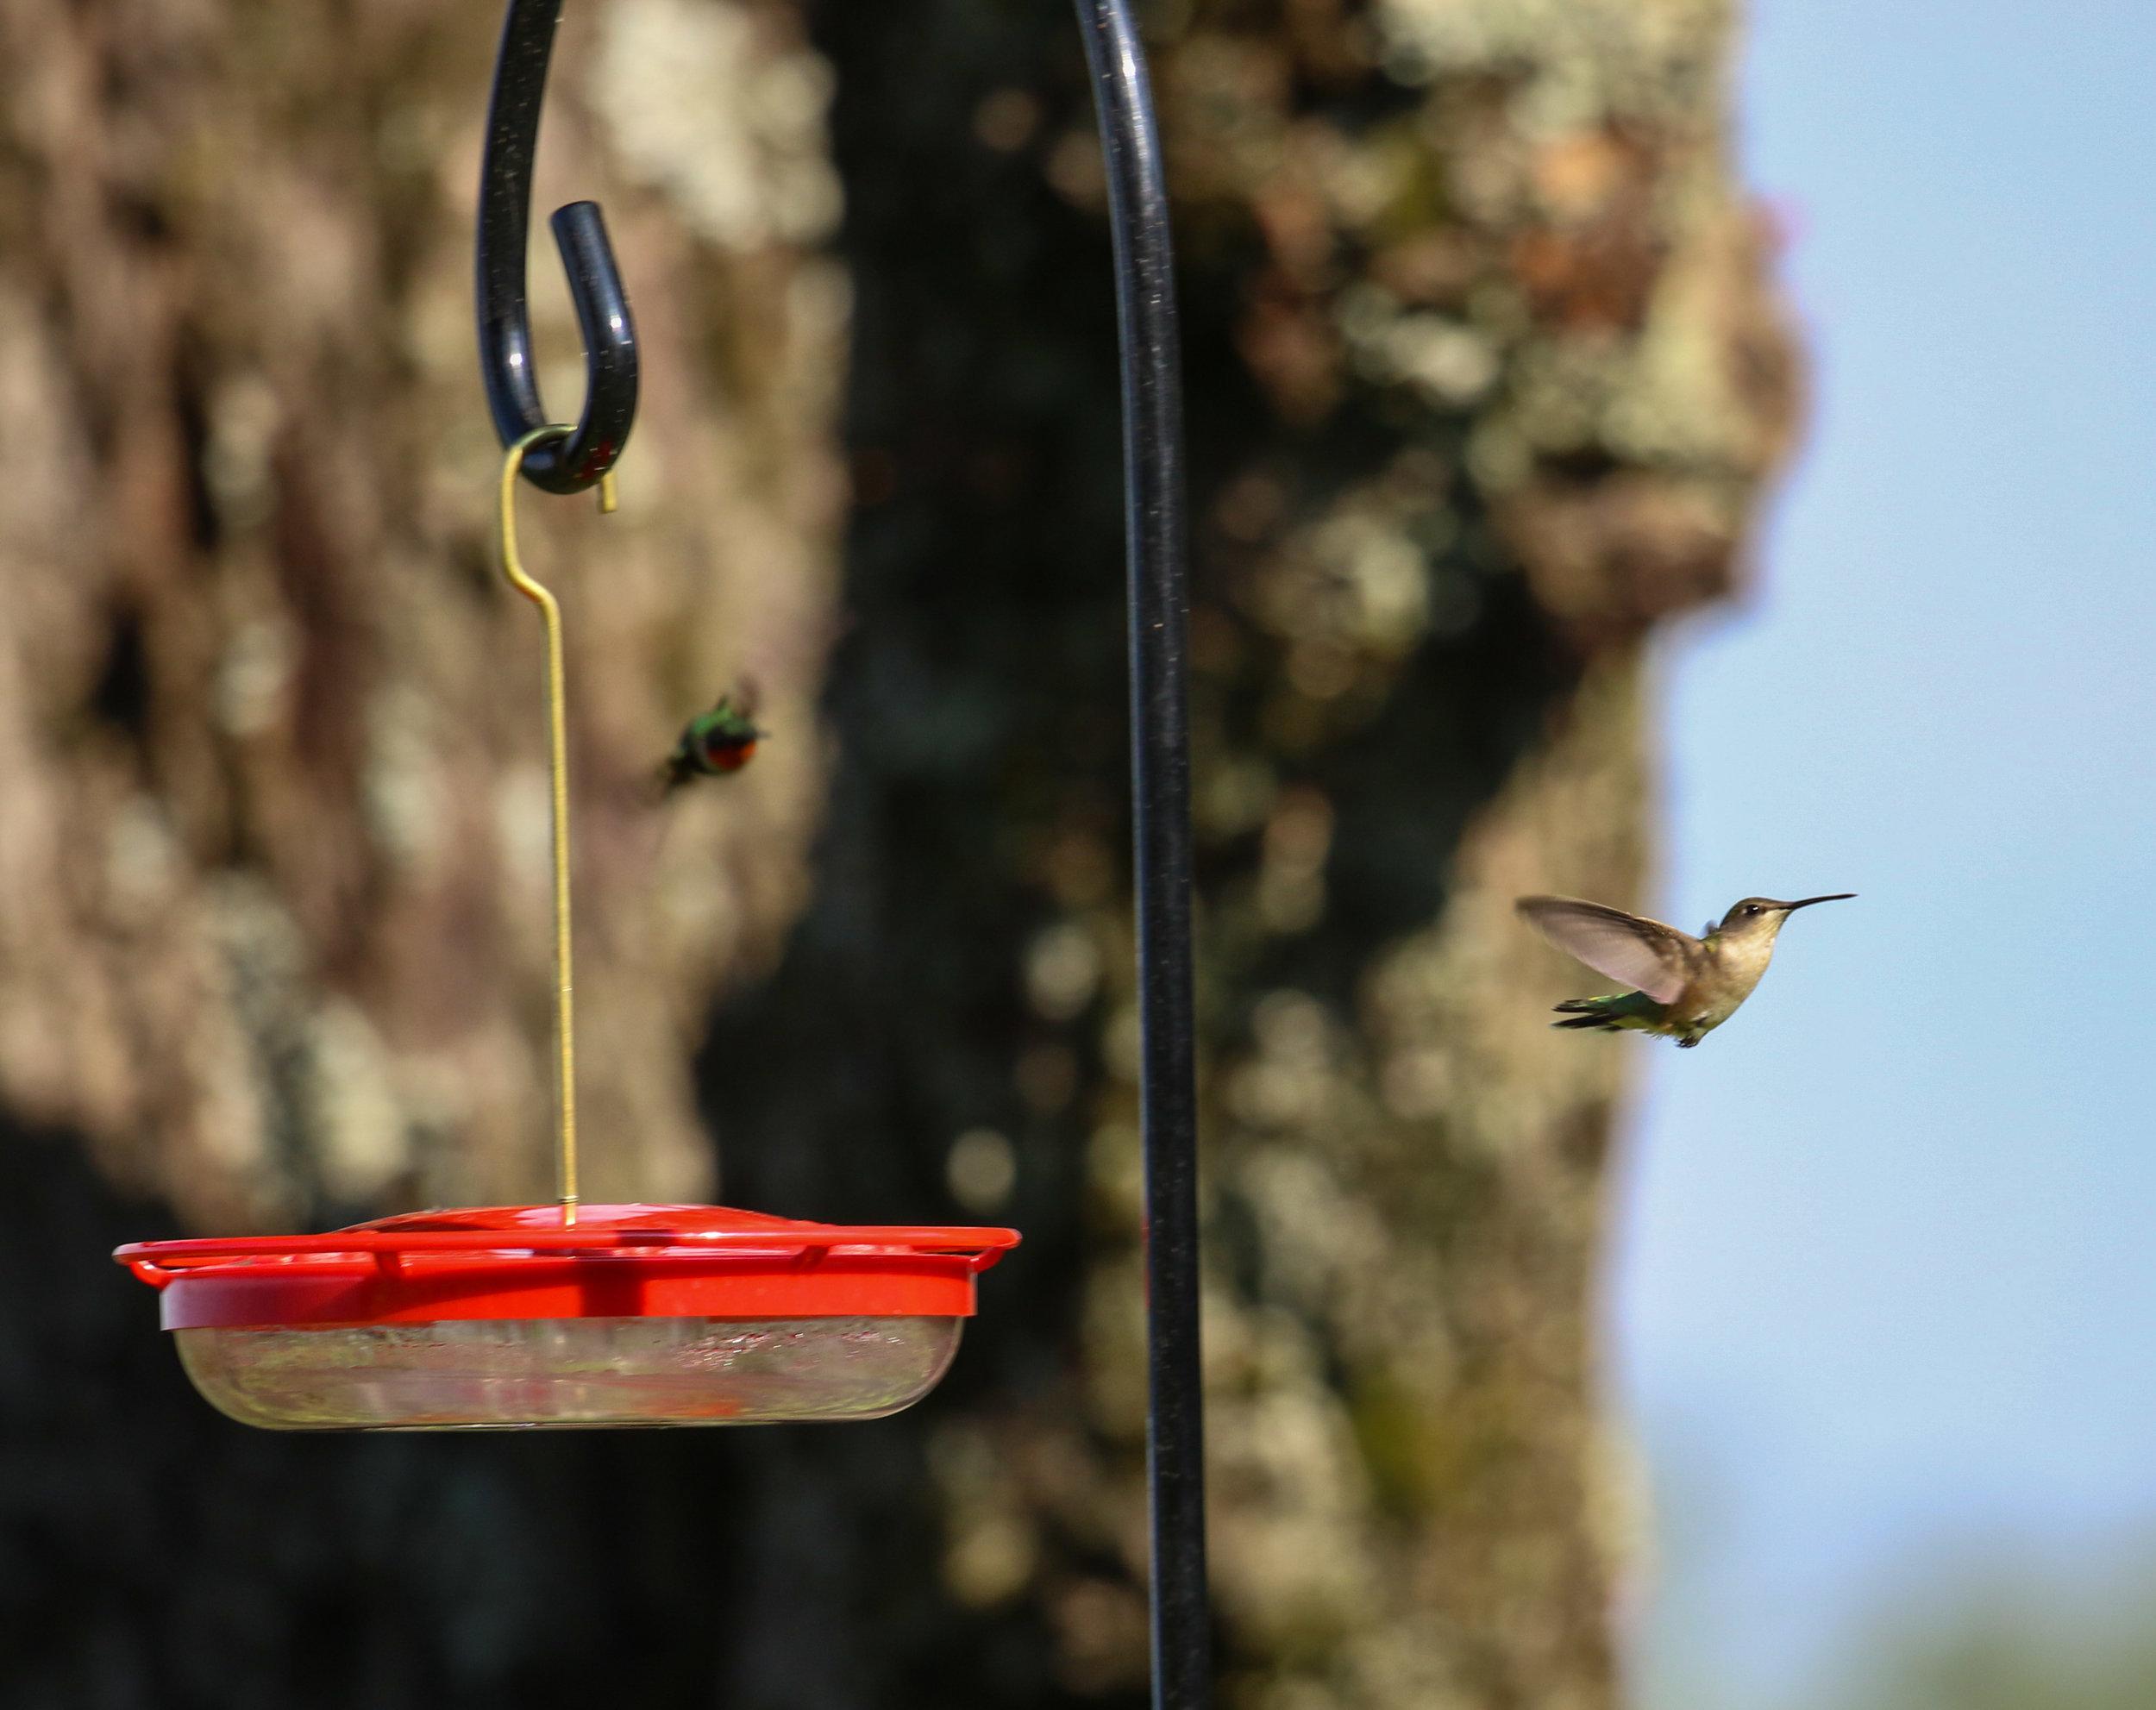 Hummingbirds North Carolina chase 1 of 1).jpg